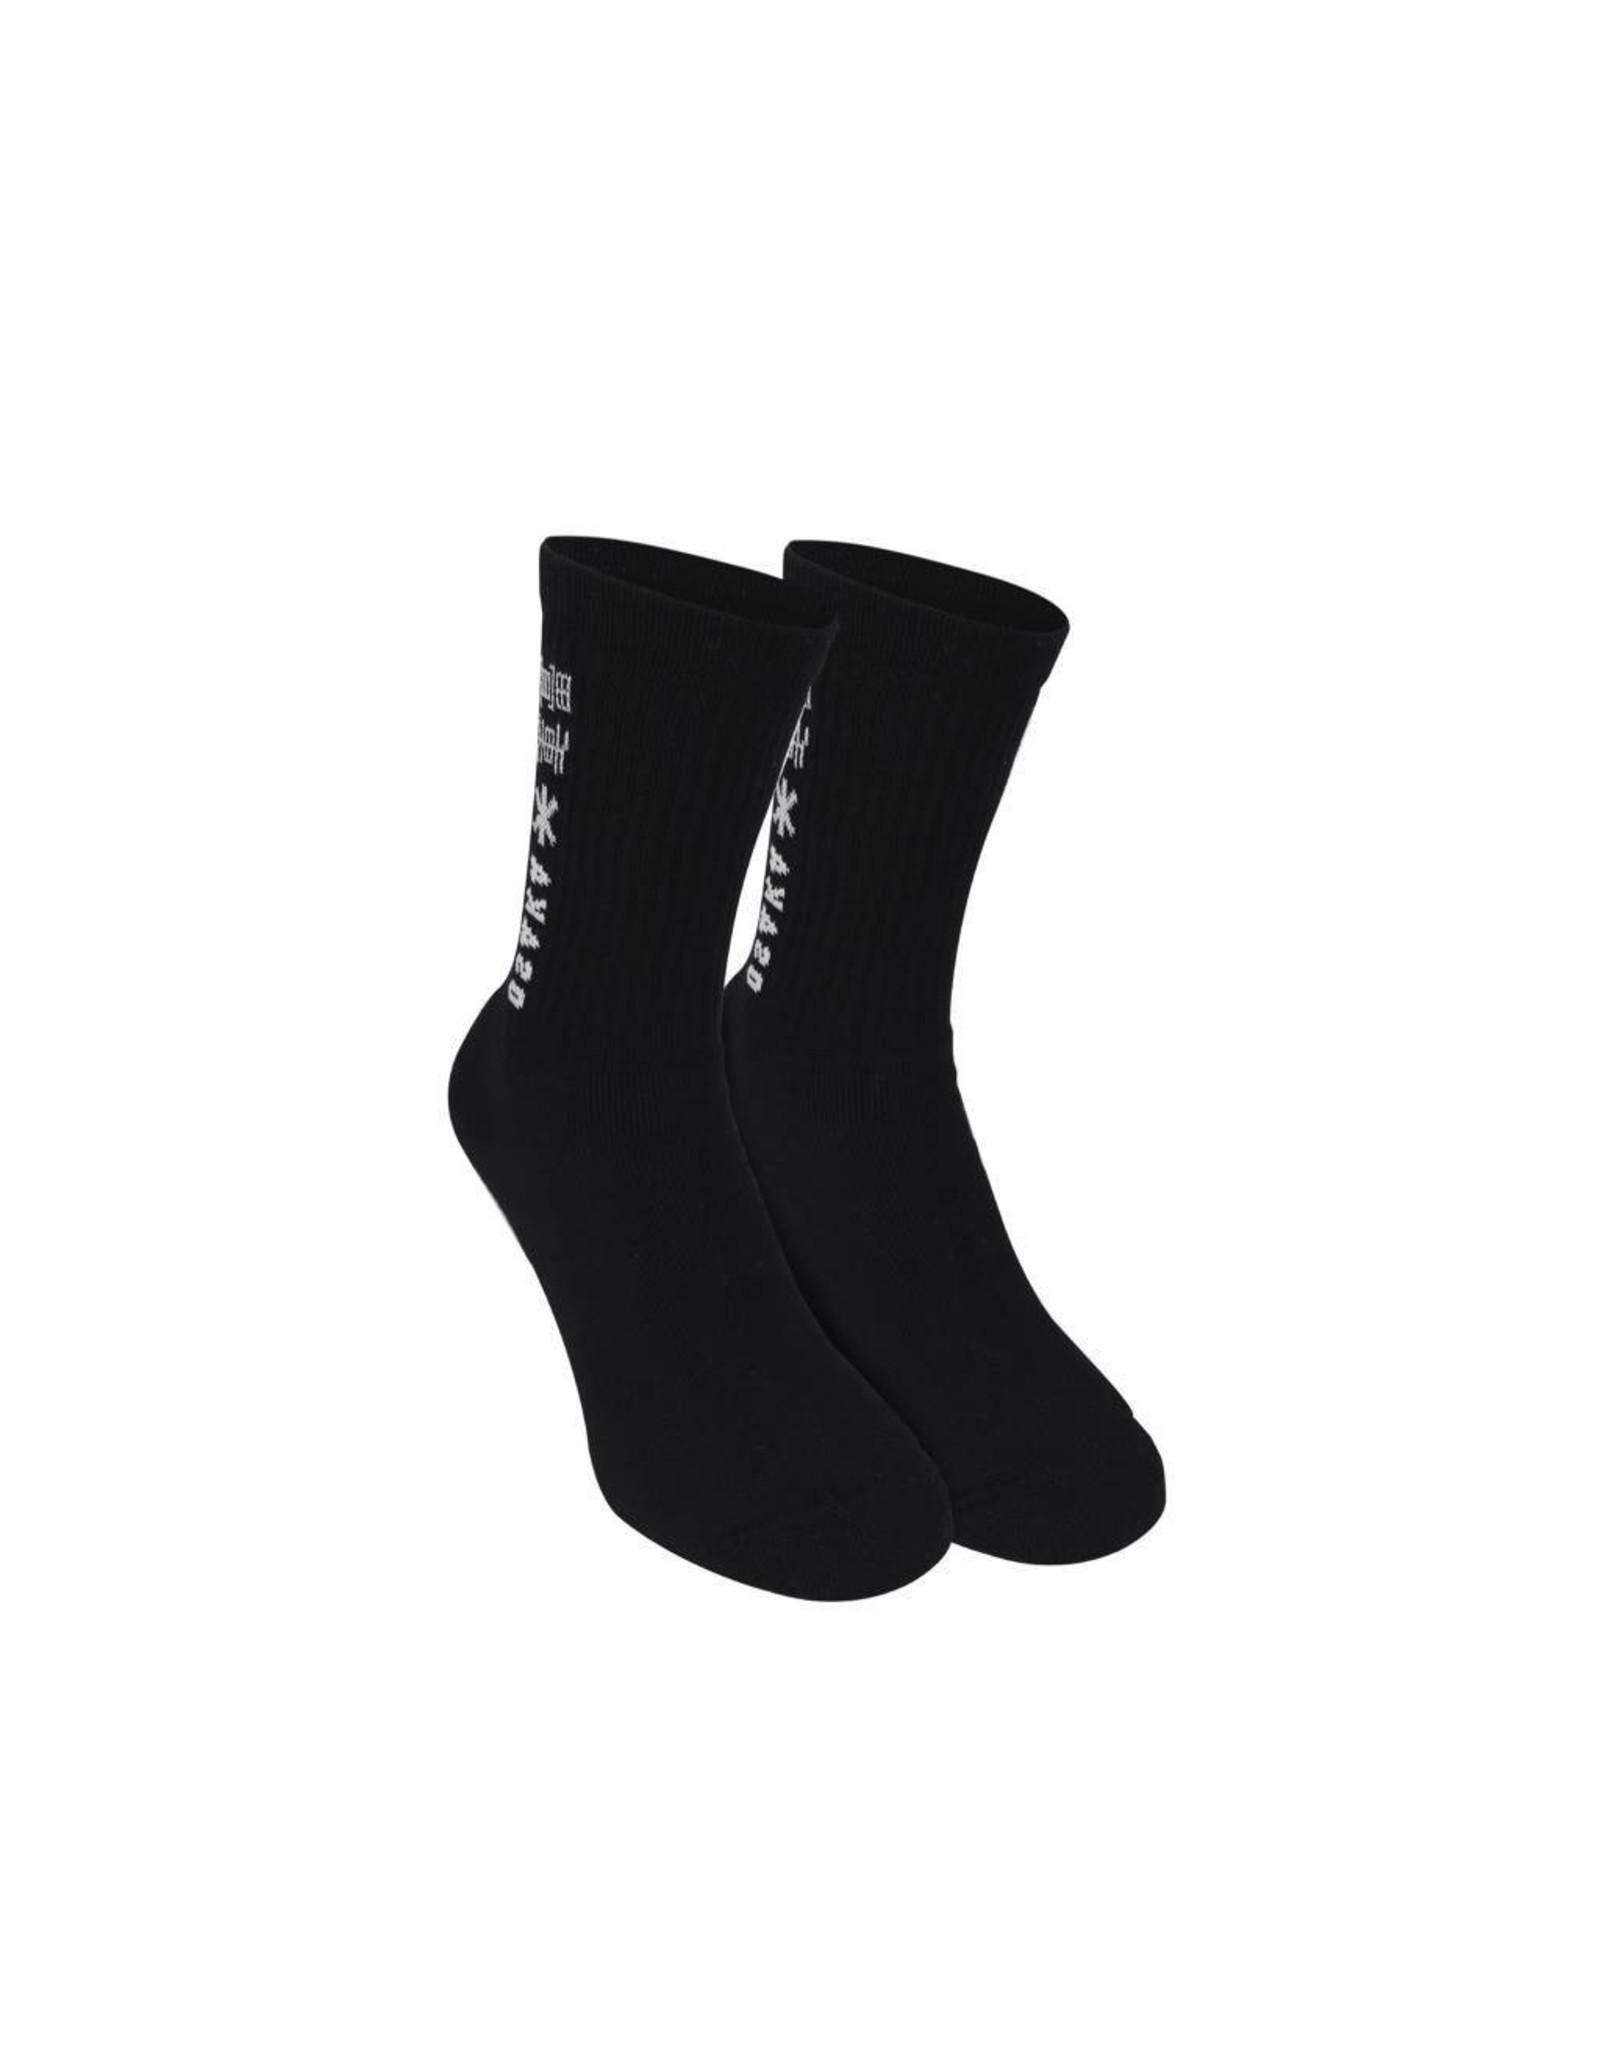 Osaka Basic Socks Duo Pack Black